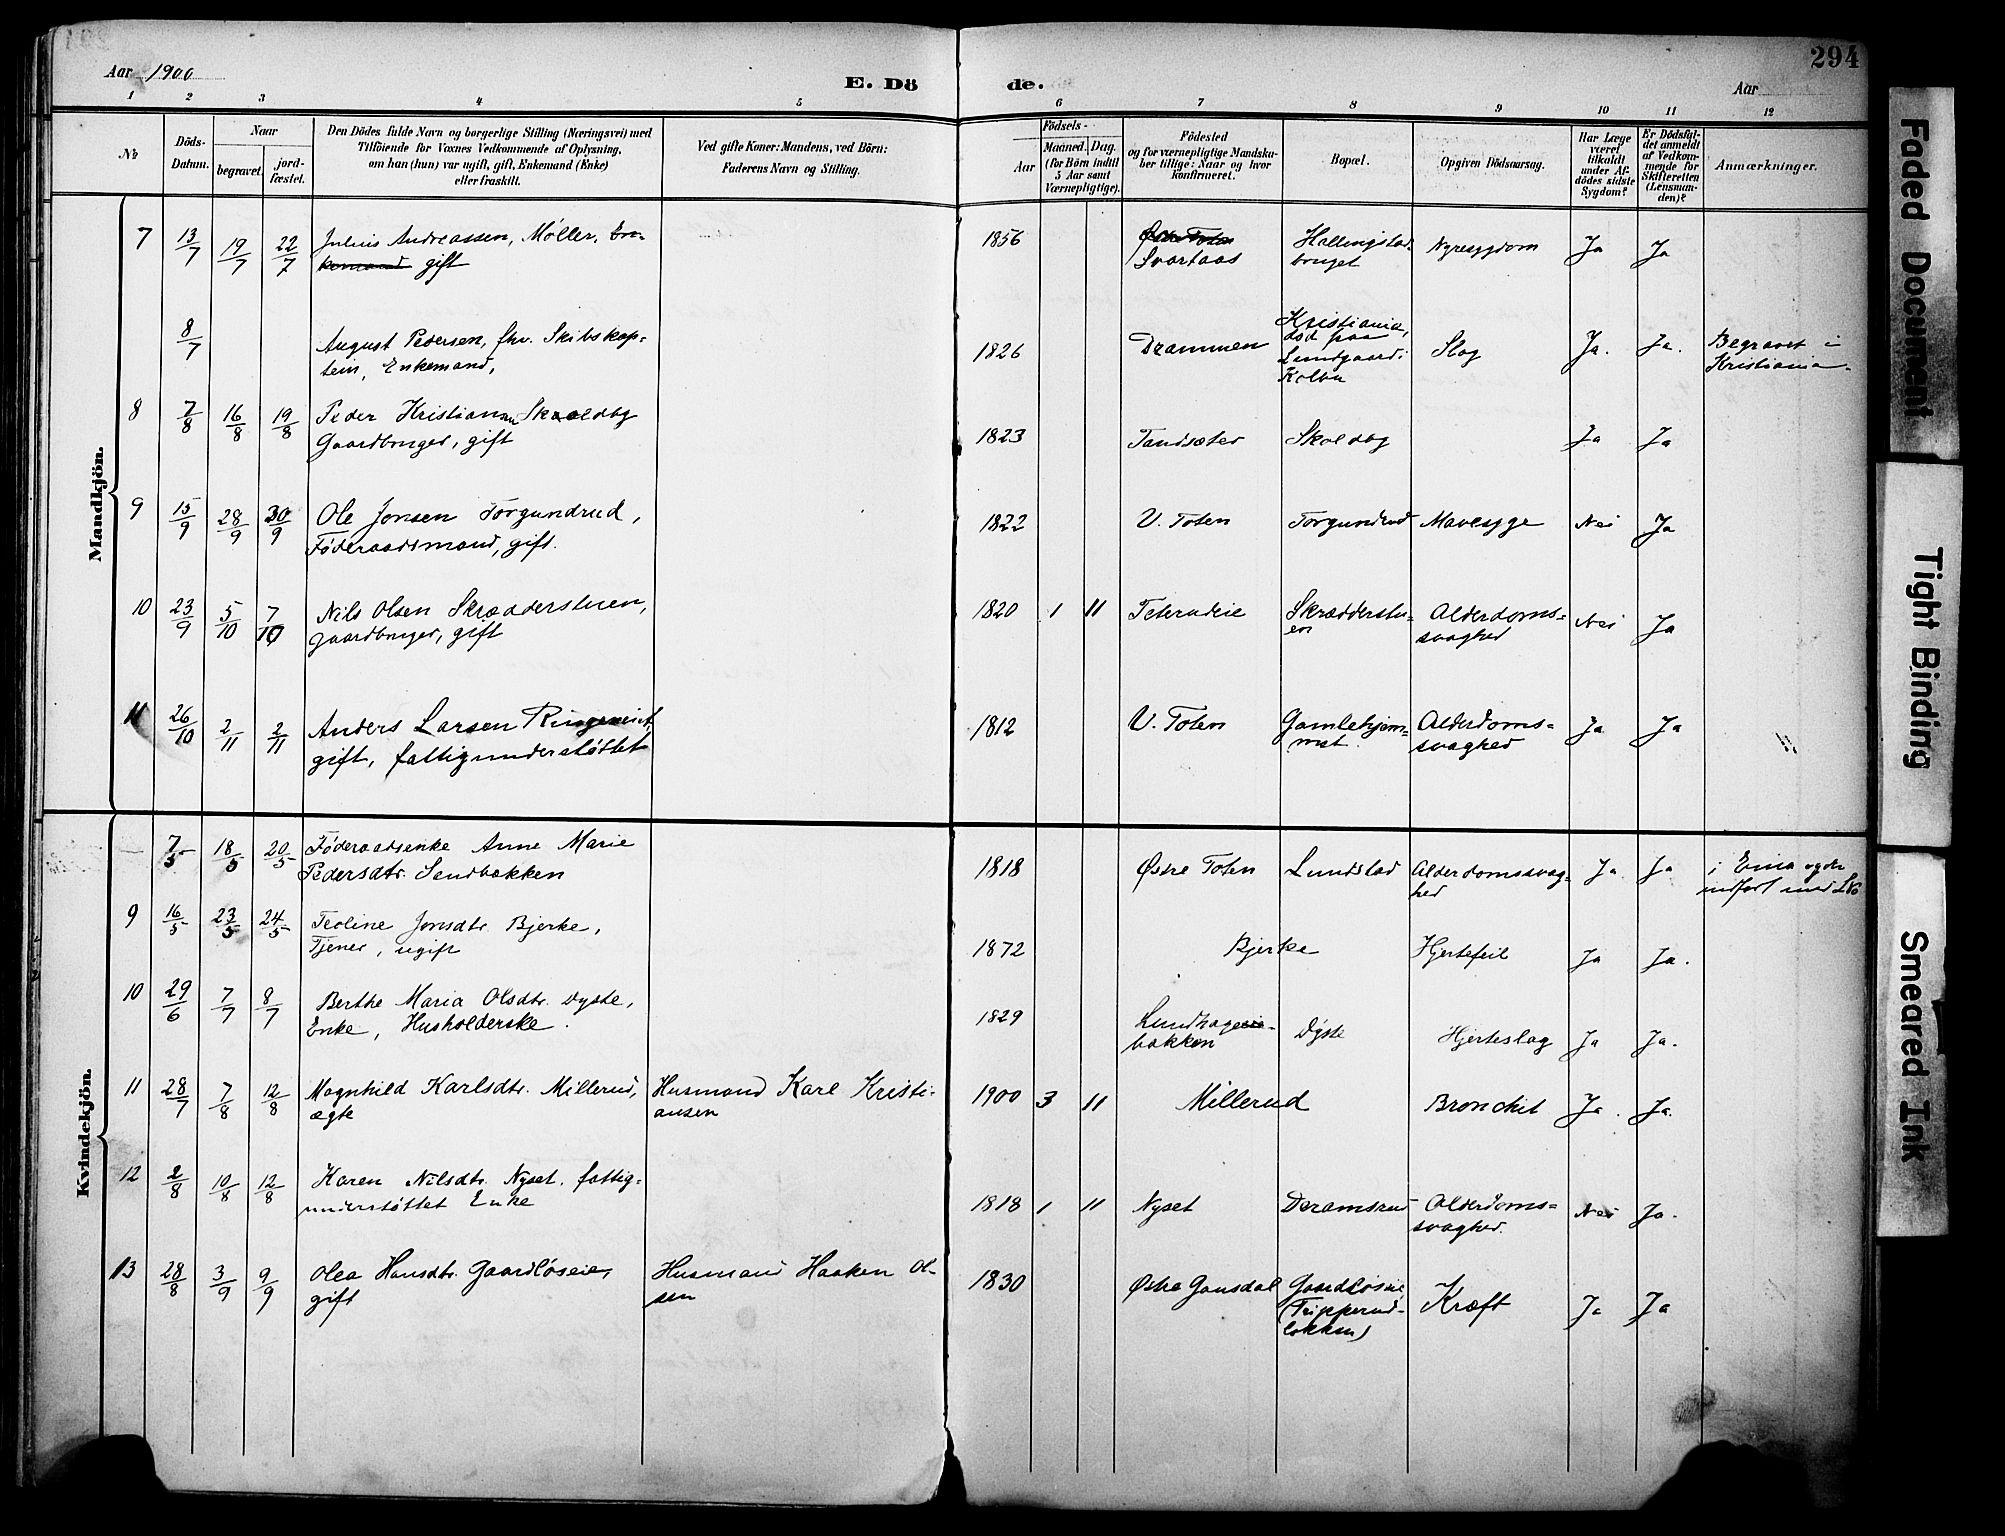 SAH, Vestre Toten prestekontor, H/Ha/Haa/L0013: Ministerialbok nr. 13, 1895-1911, s. 294